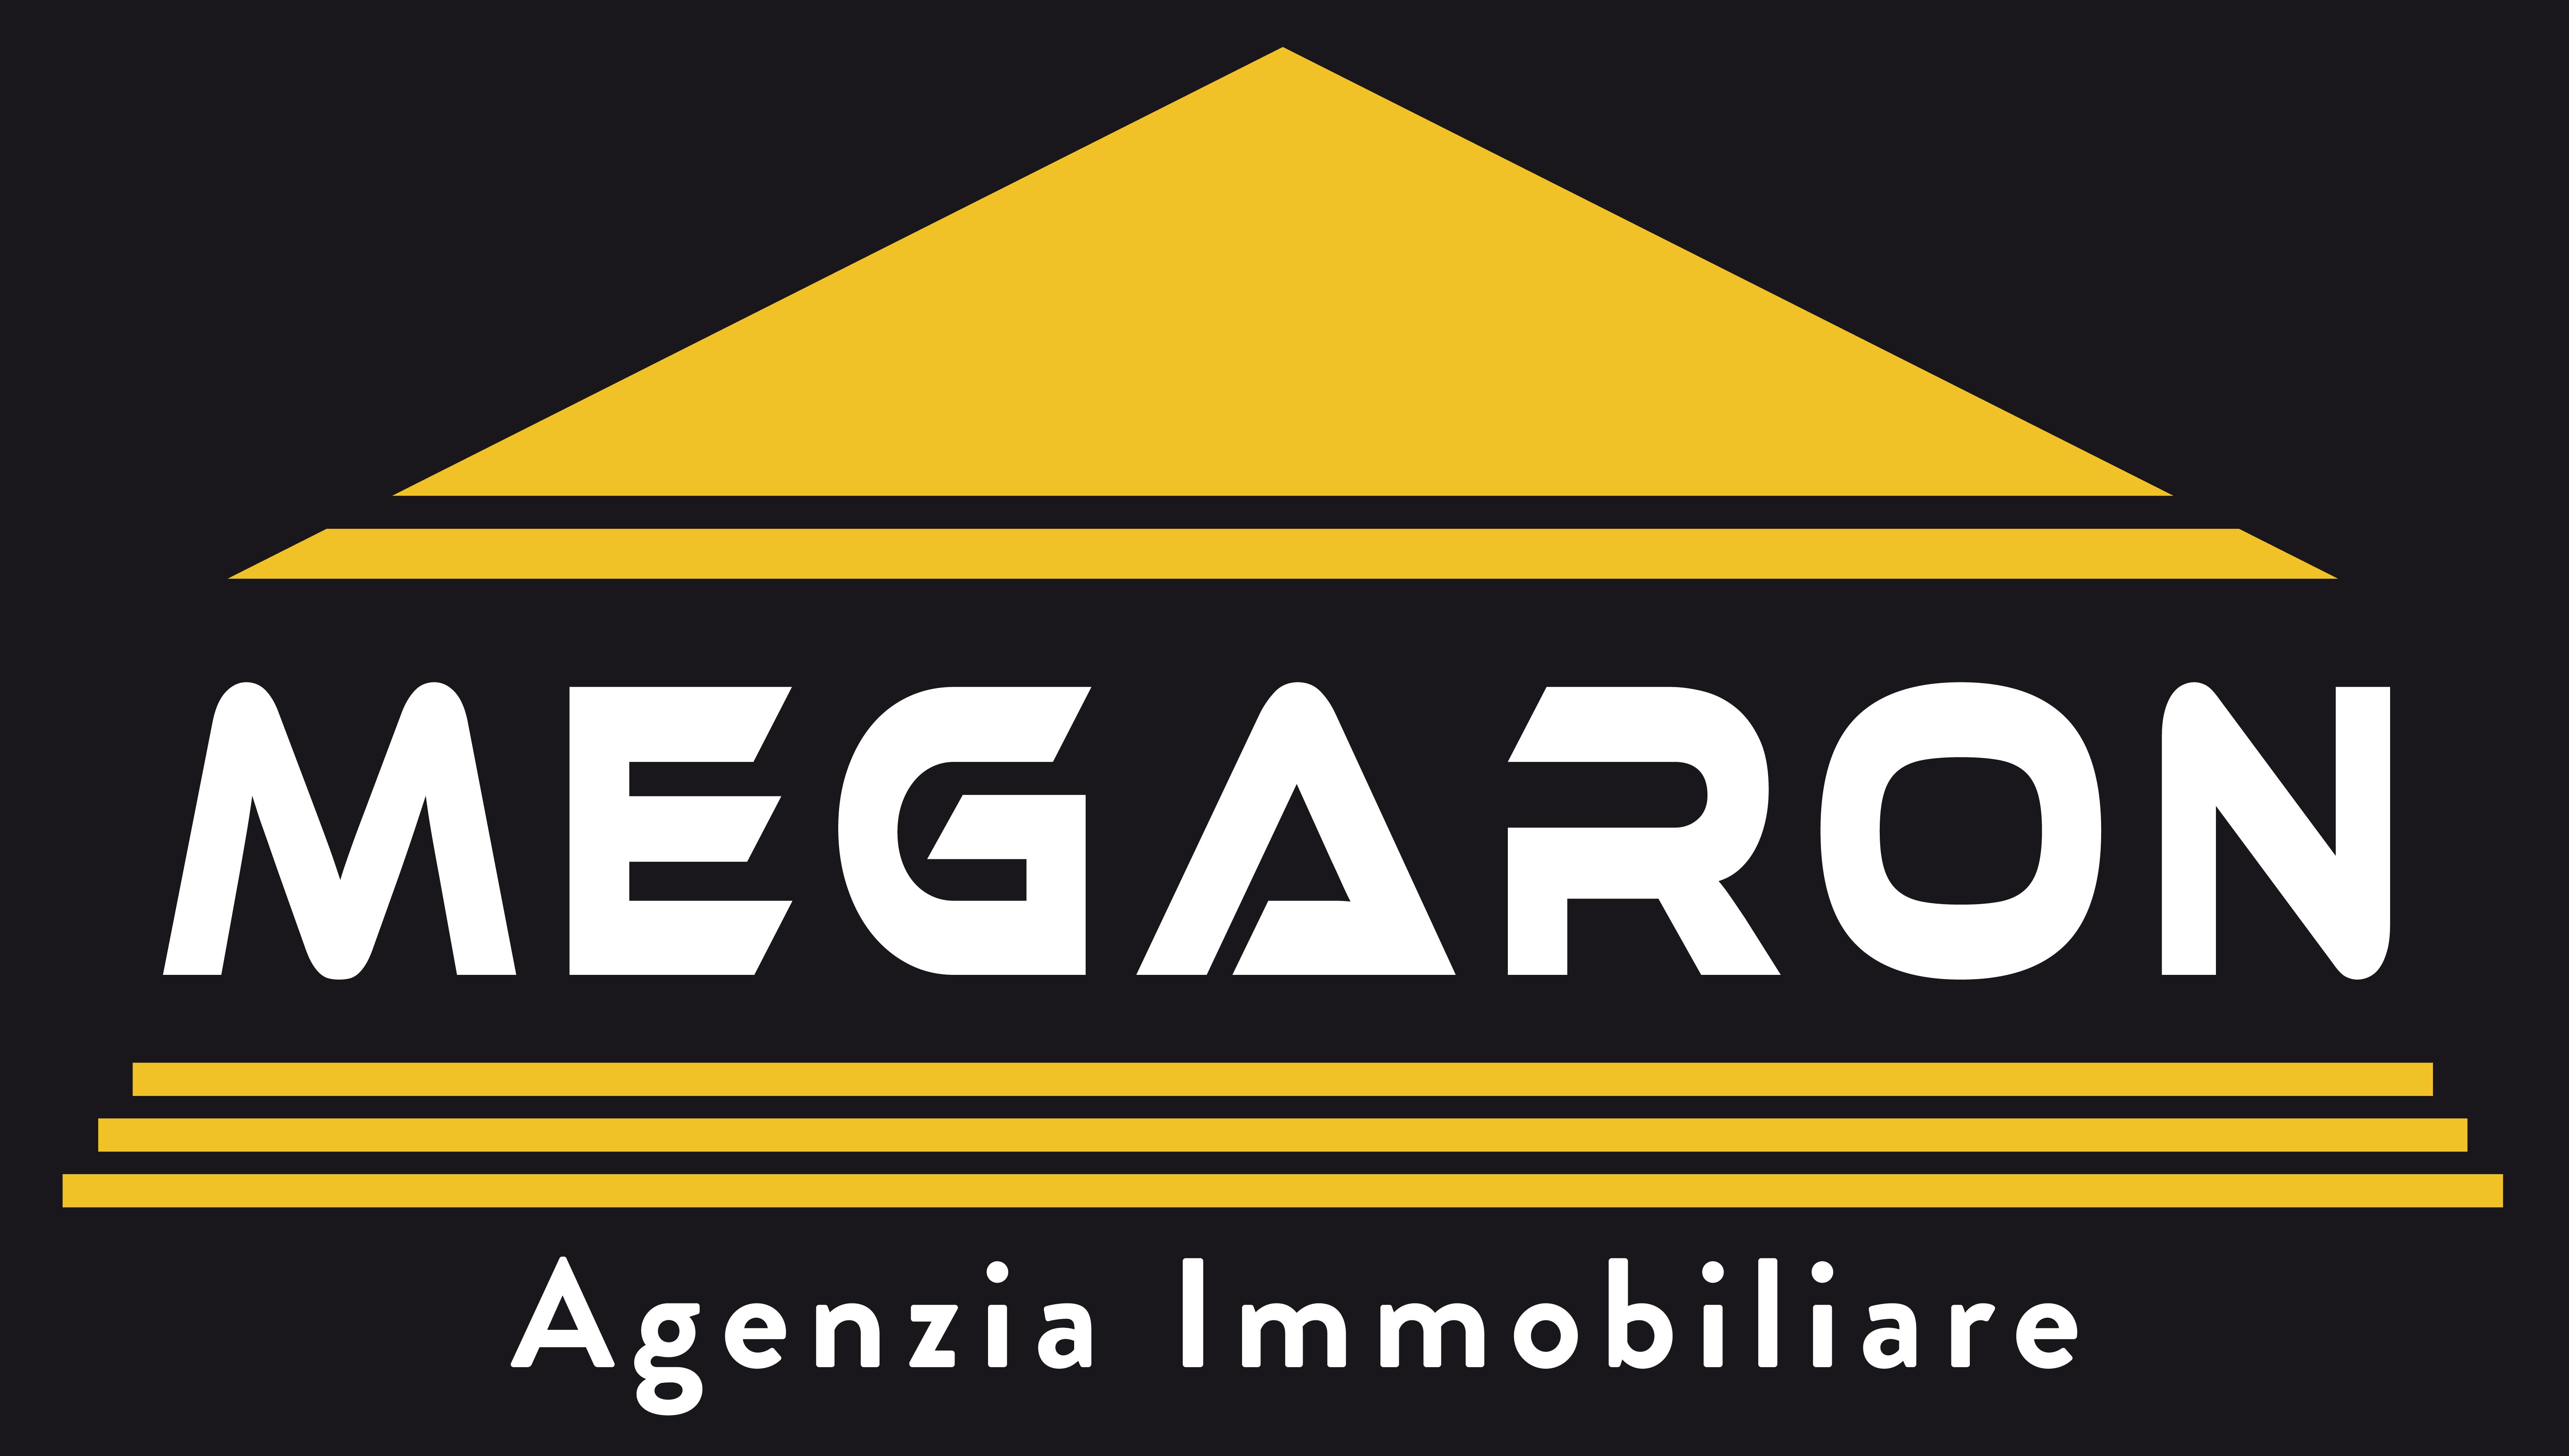 logo MEGARON - Ag. Immobiliare Pontedera